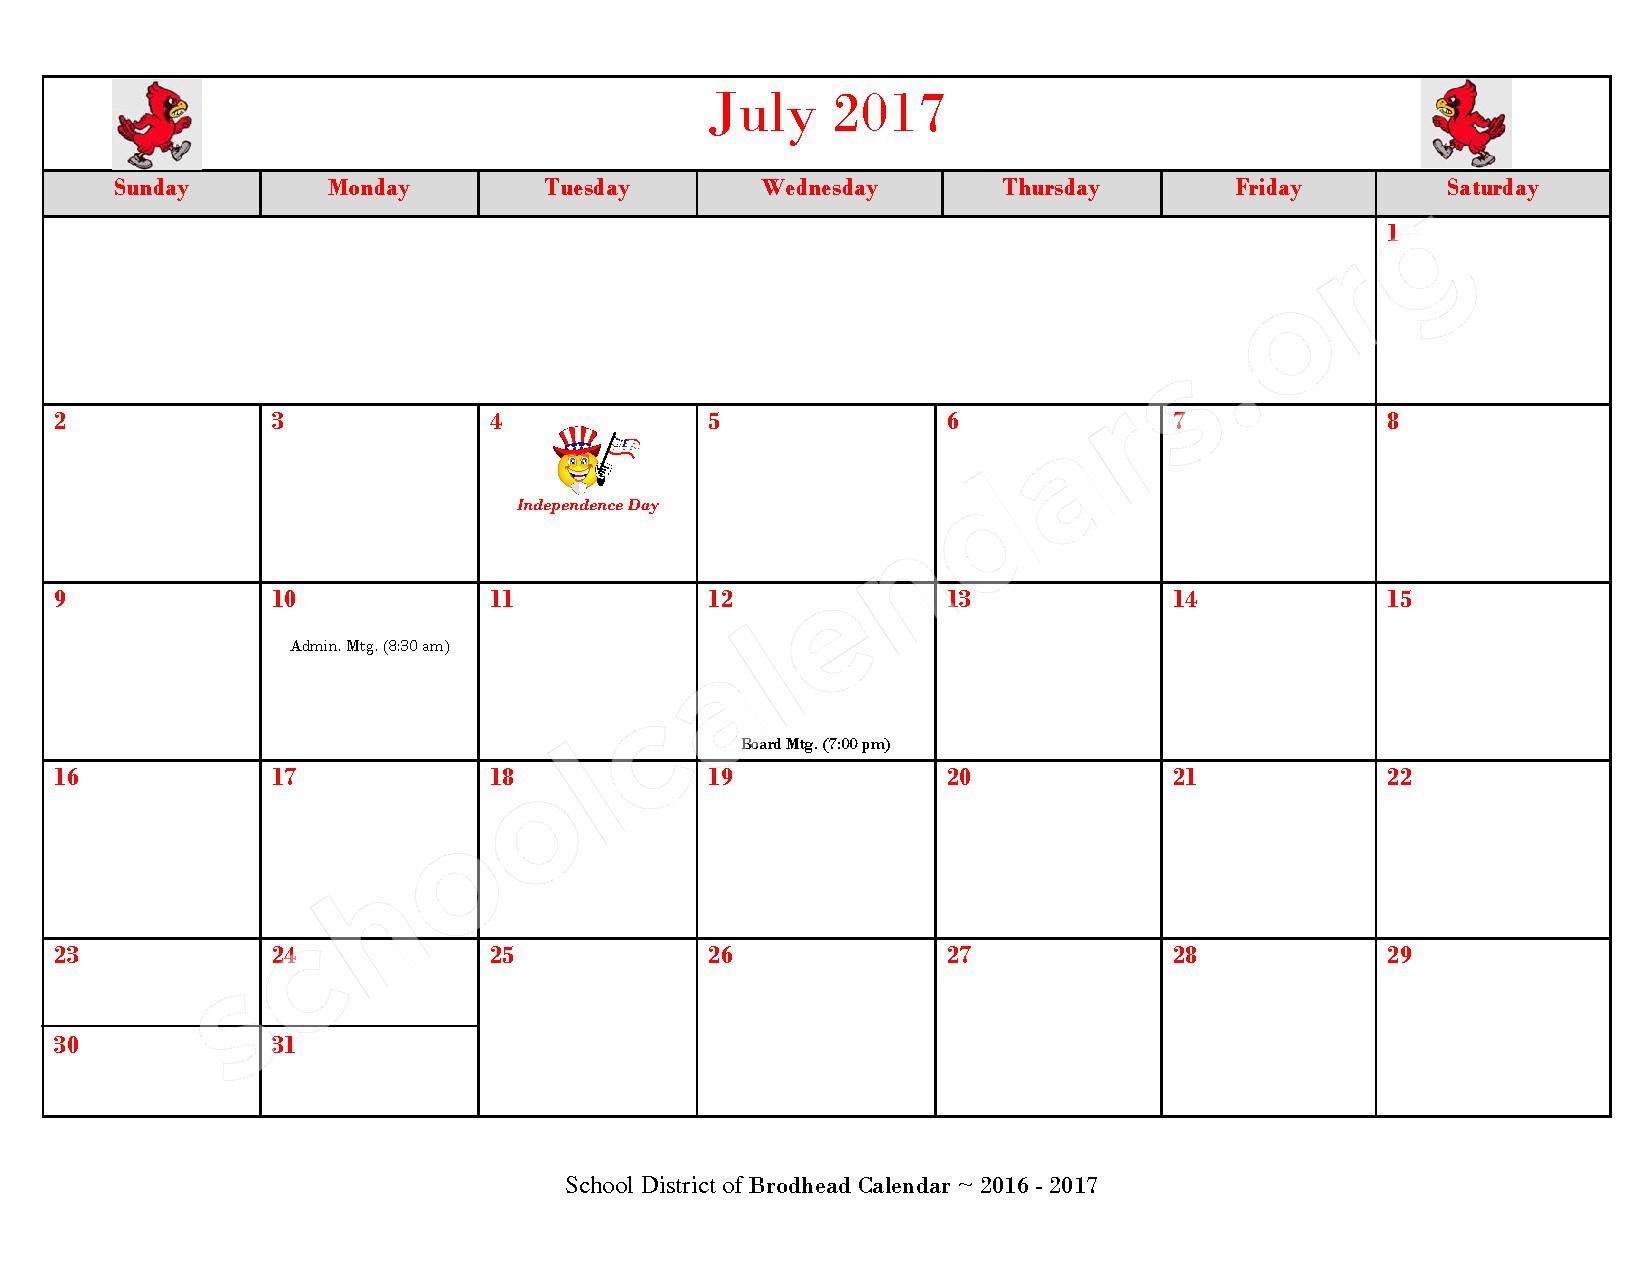 2016 - 2017 School Calendar – Brodhead School District – page 12